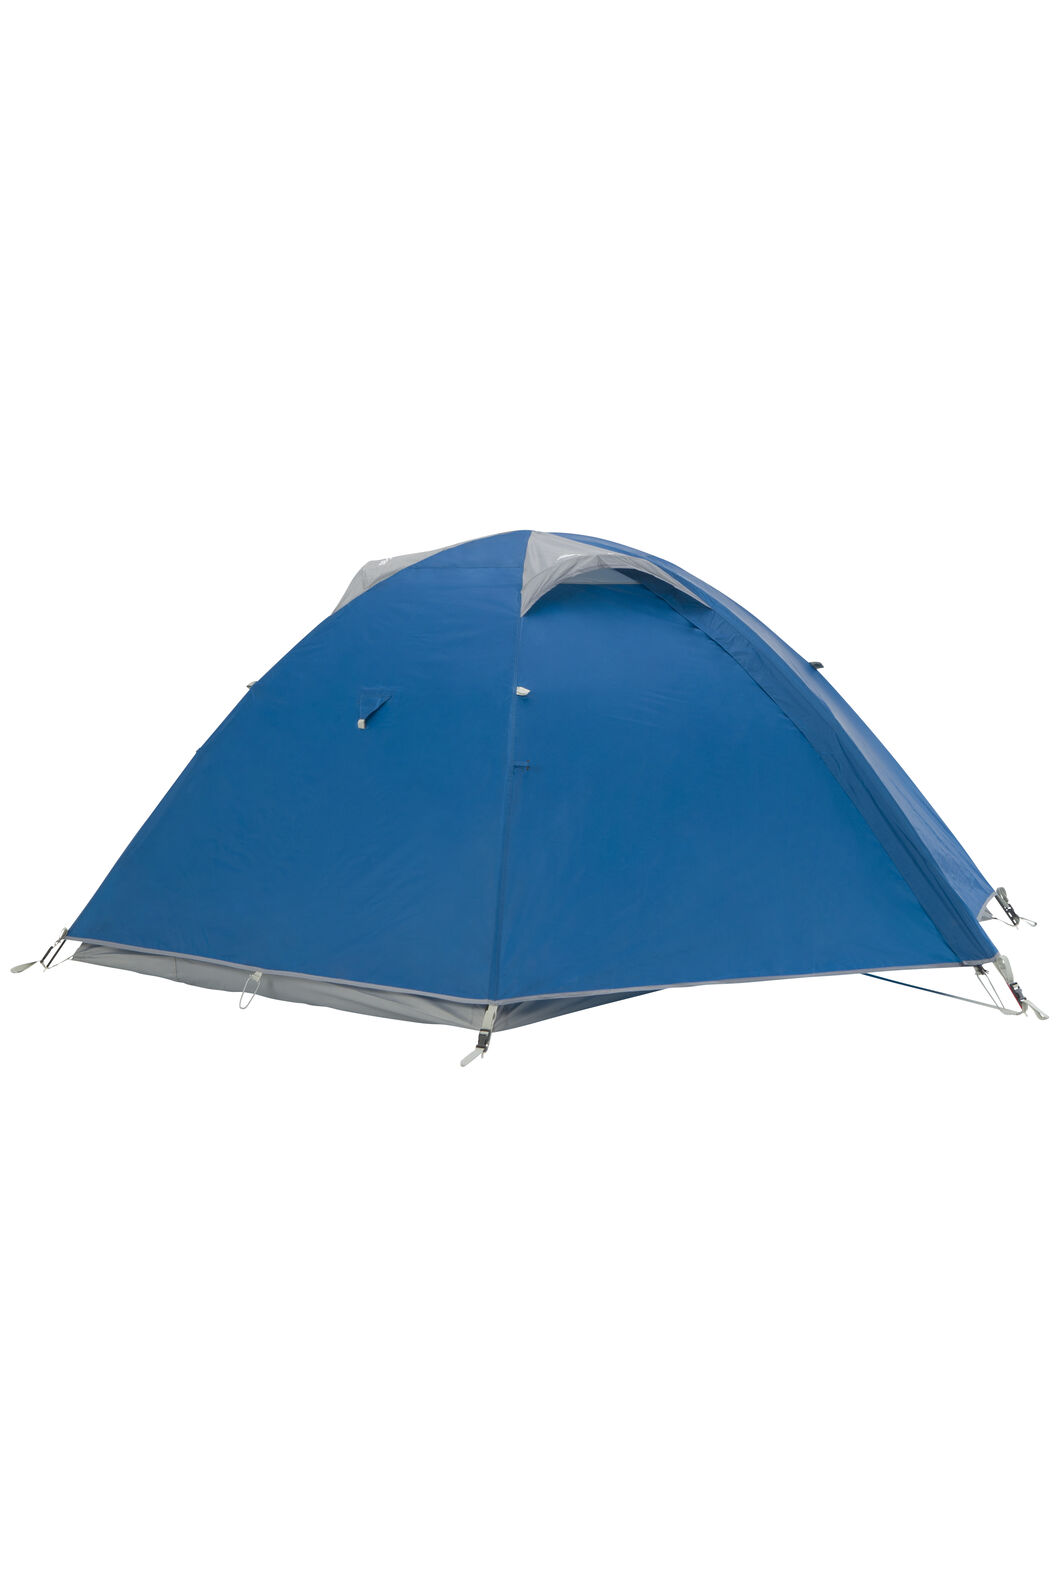 Polaris Camping Tent, Imperial Blue, hi-res